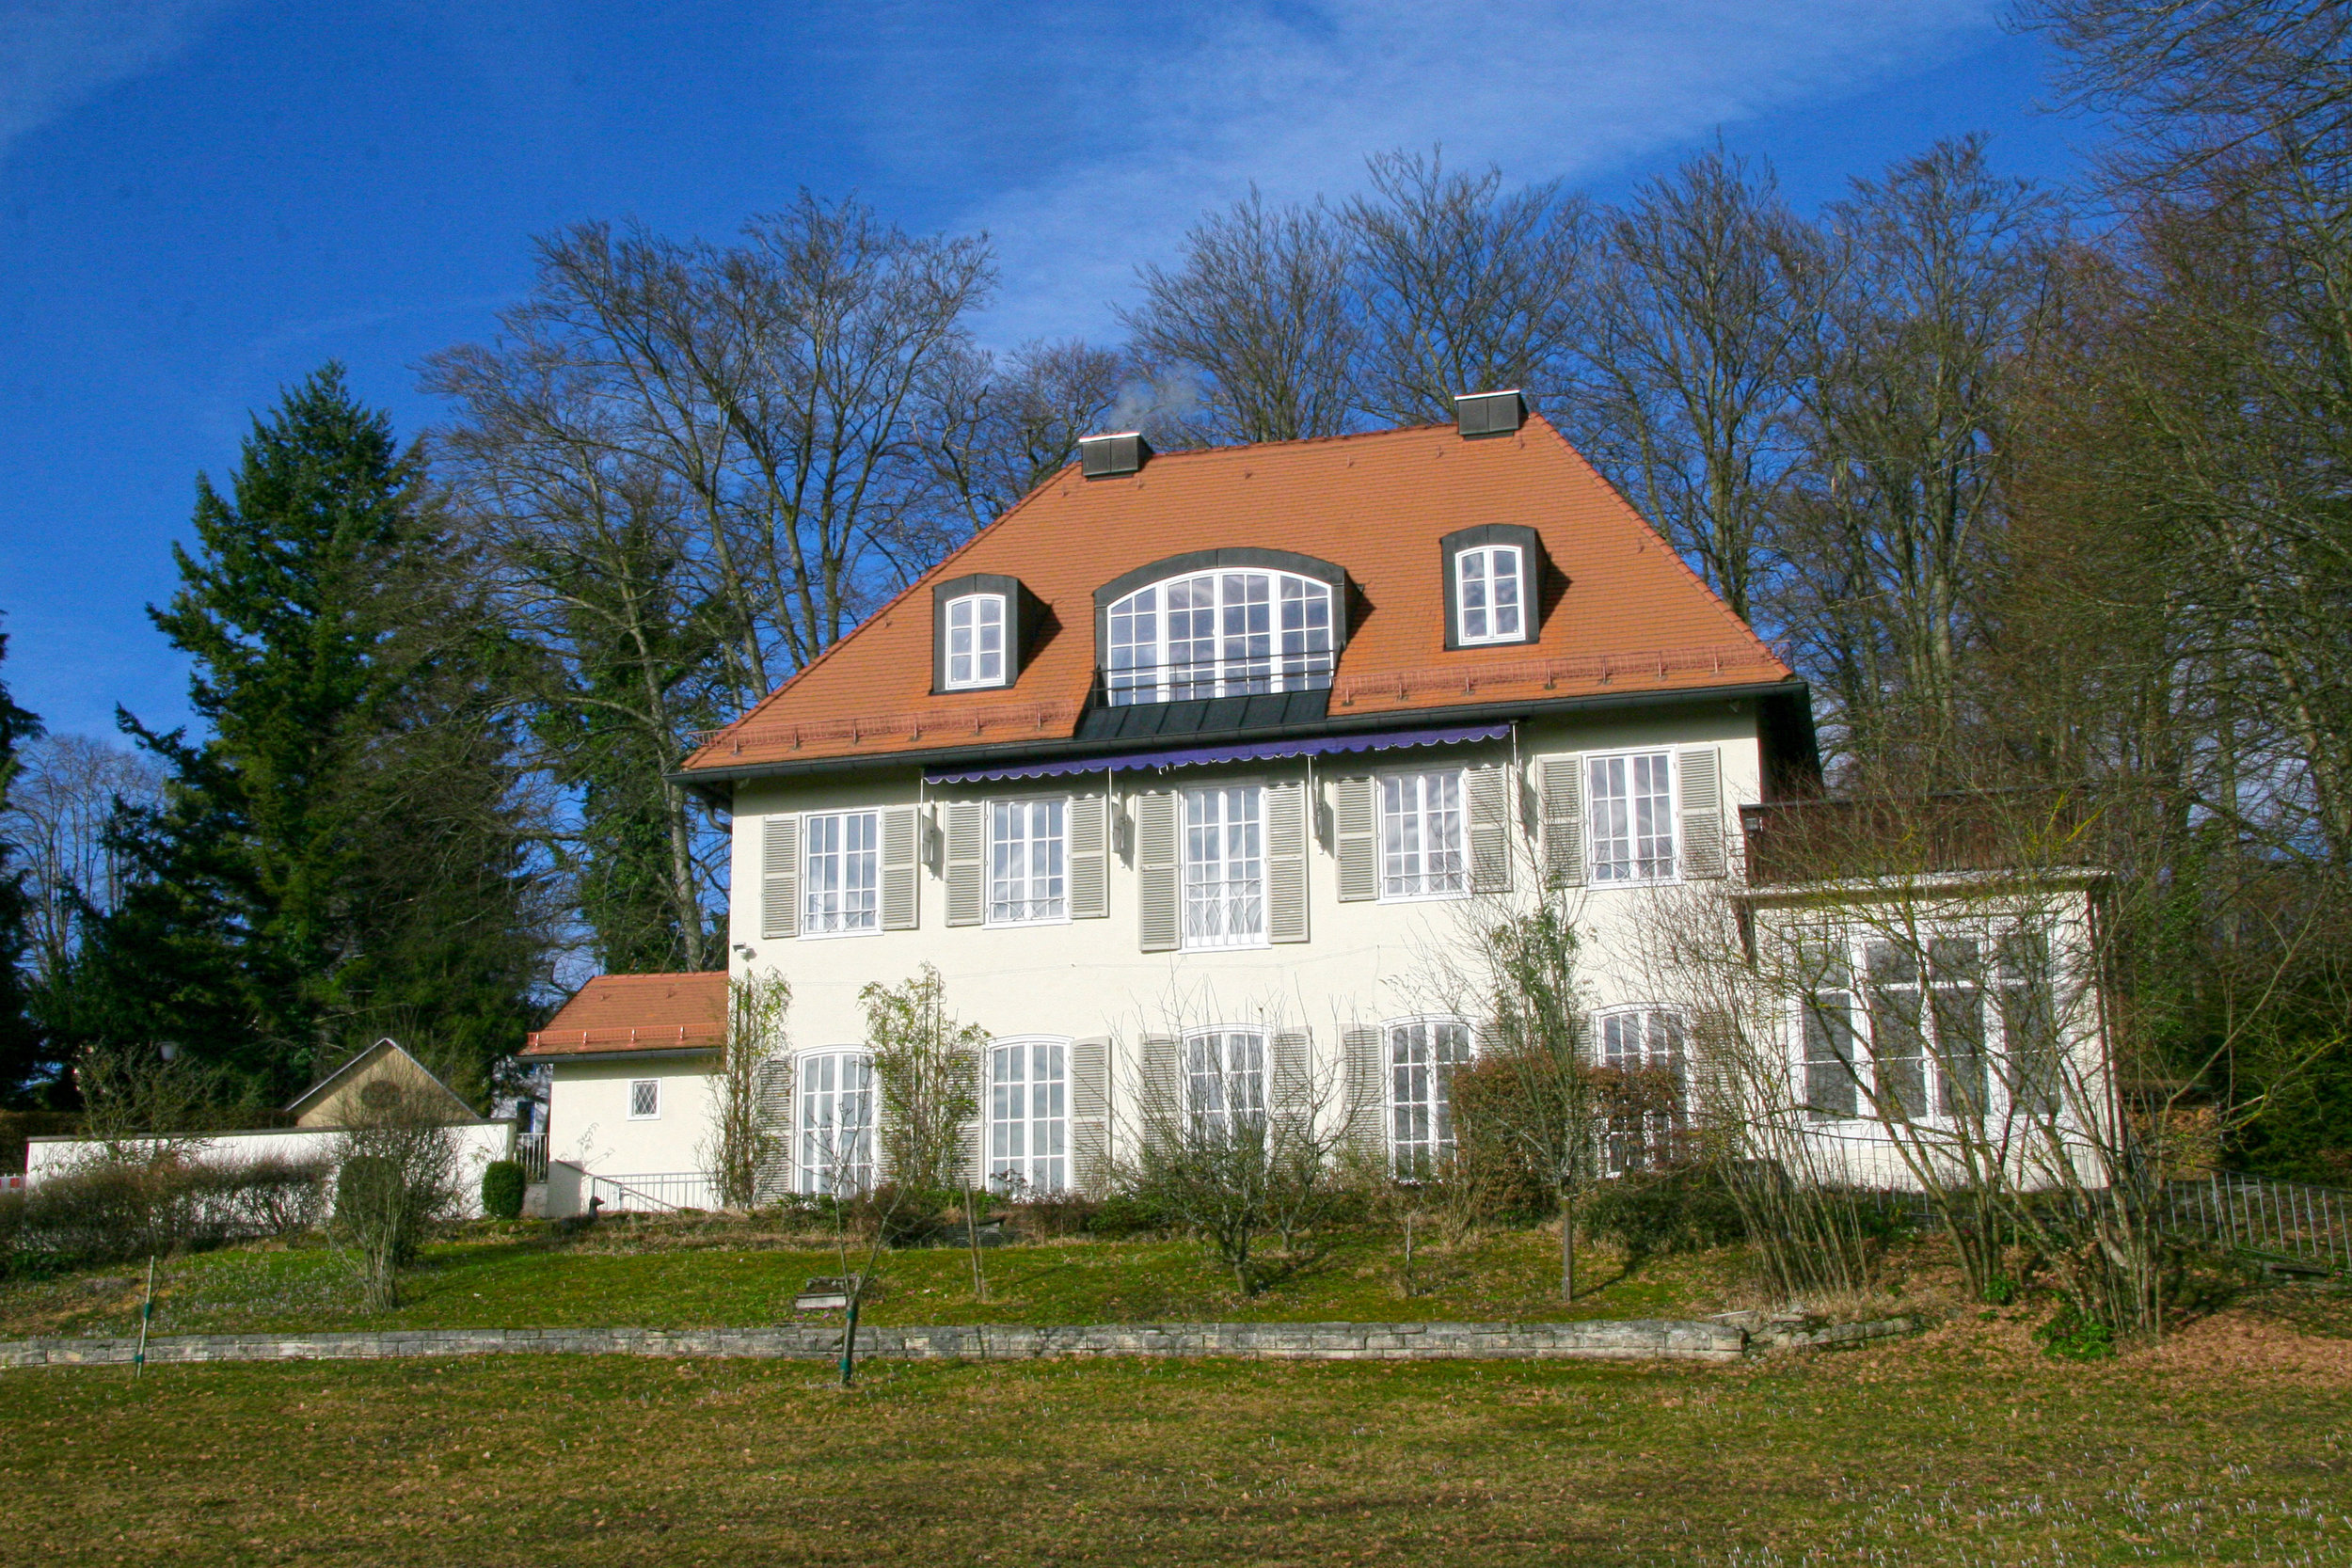 Herrschaftliches Anwesen am Starnberger See Immobilienmakler Andreas Botas